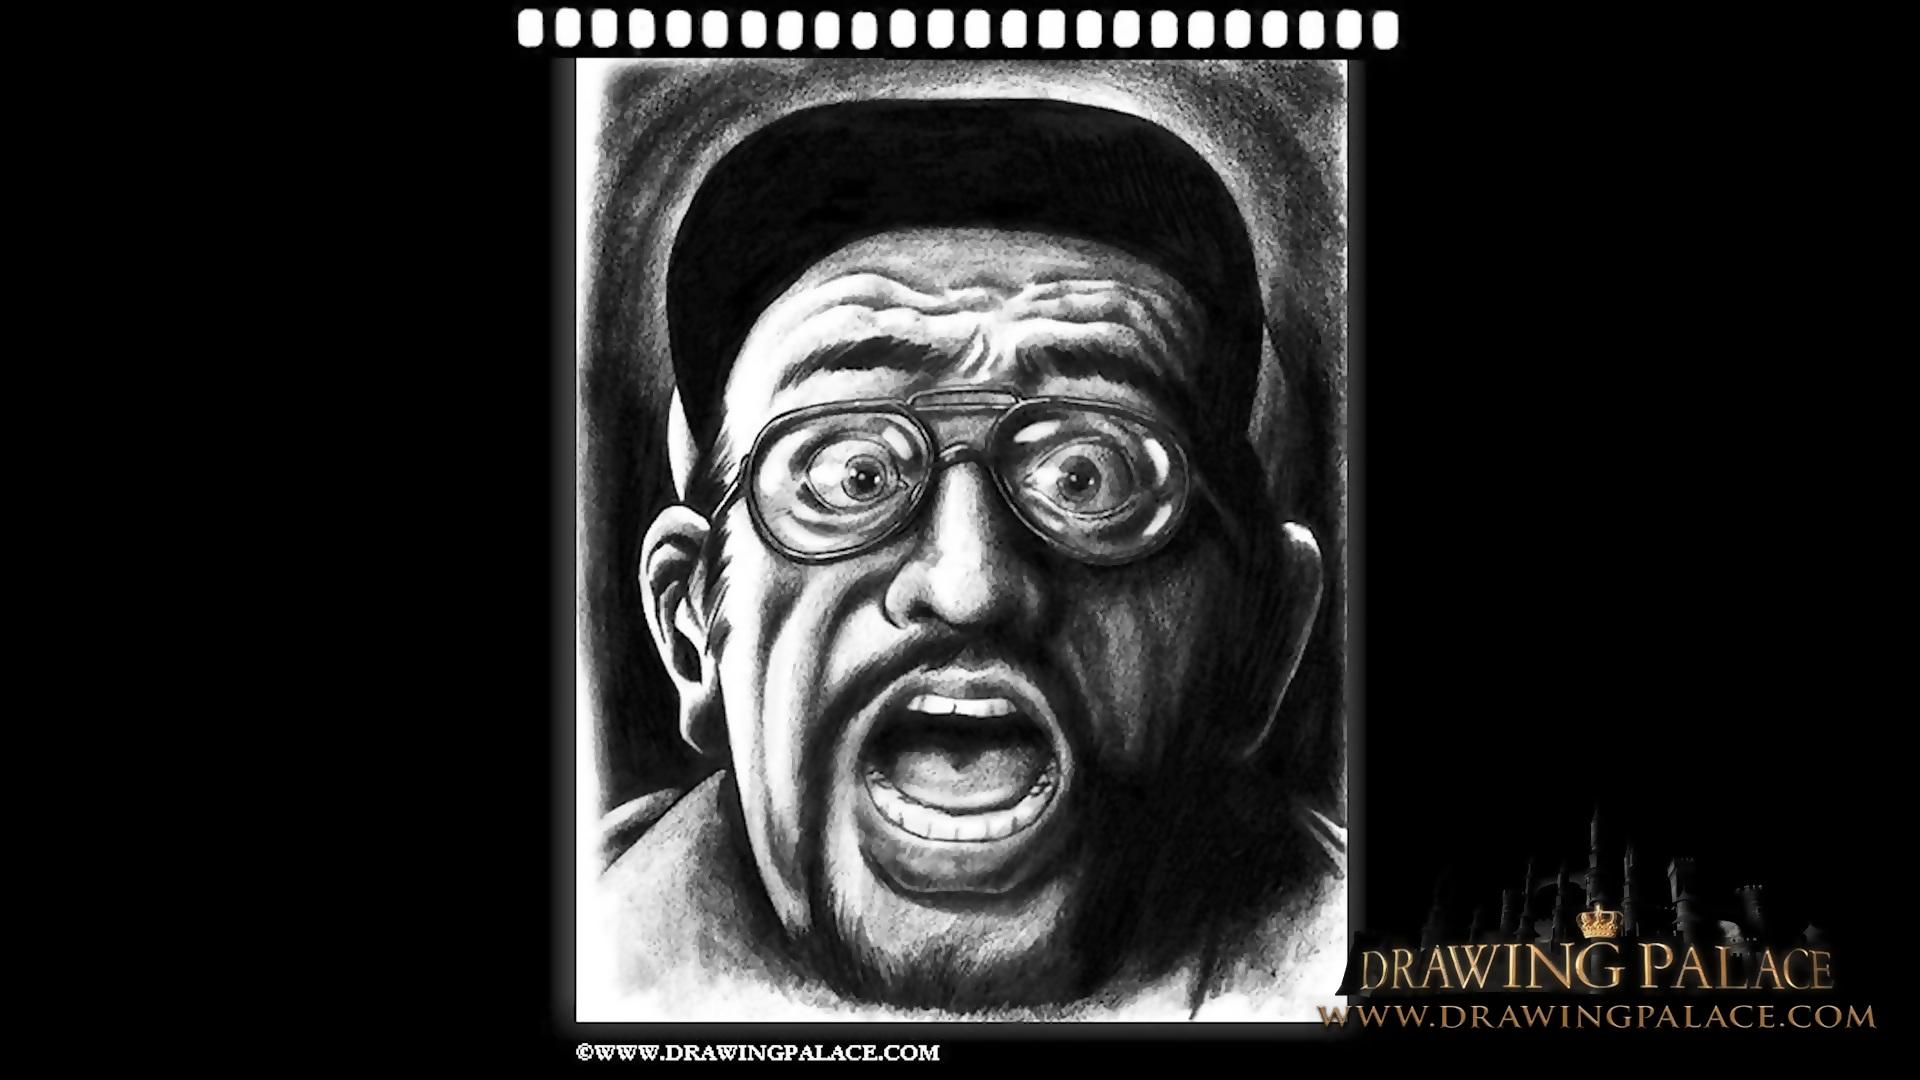 Bdsm 3D Comic Torture Porn Drawing Palace drawingpalace realistic bdsm cartoons porn of fetish slaves